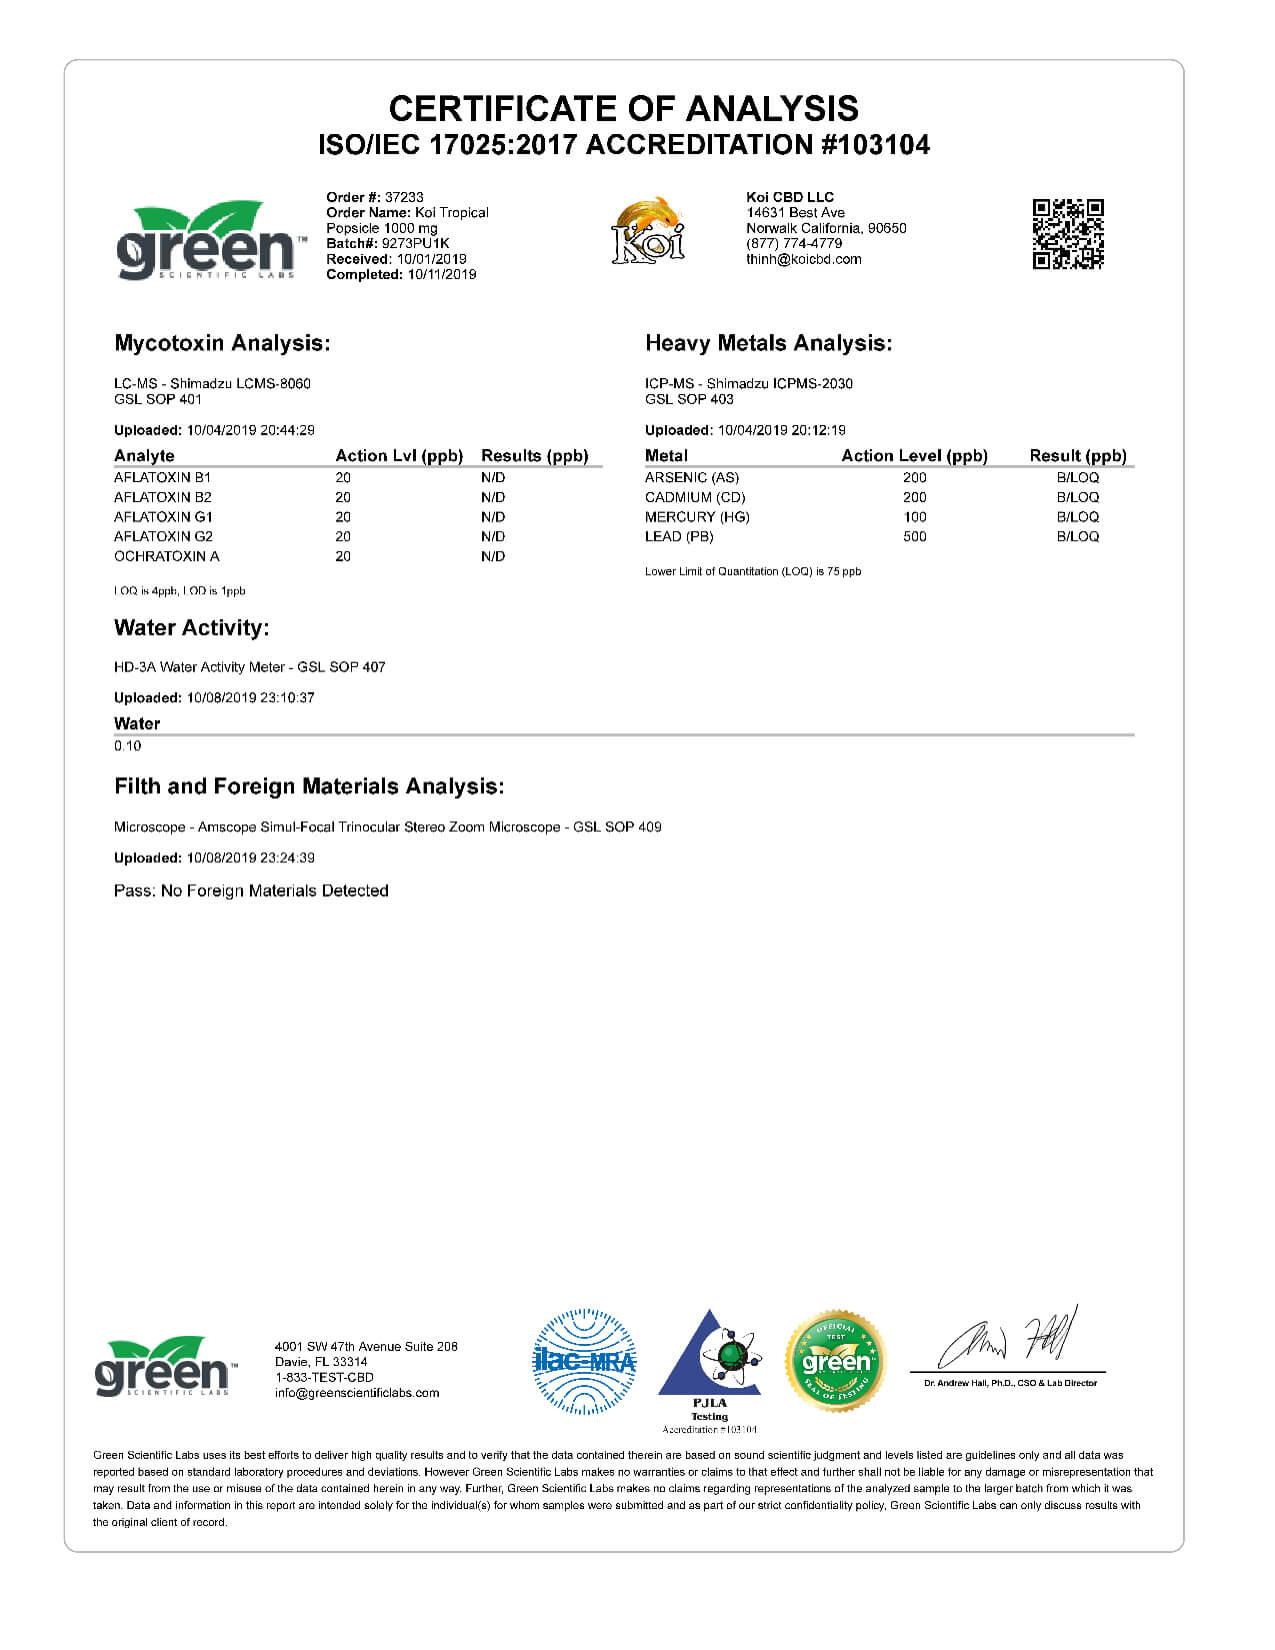 Koi CBD Tropical Popsicle Vape Oil 1000mg page6